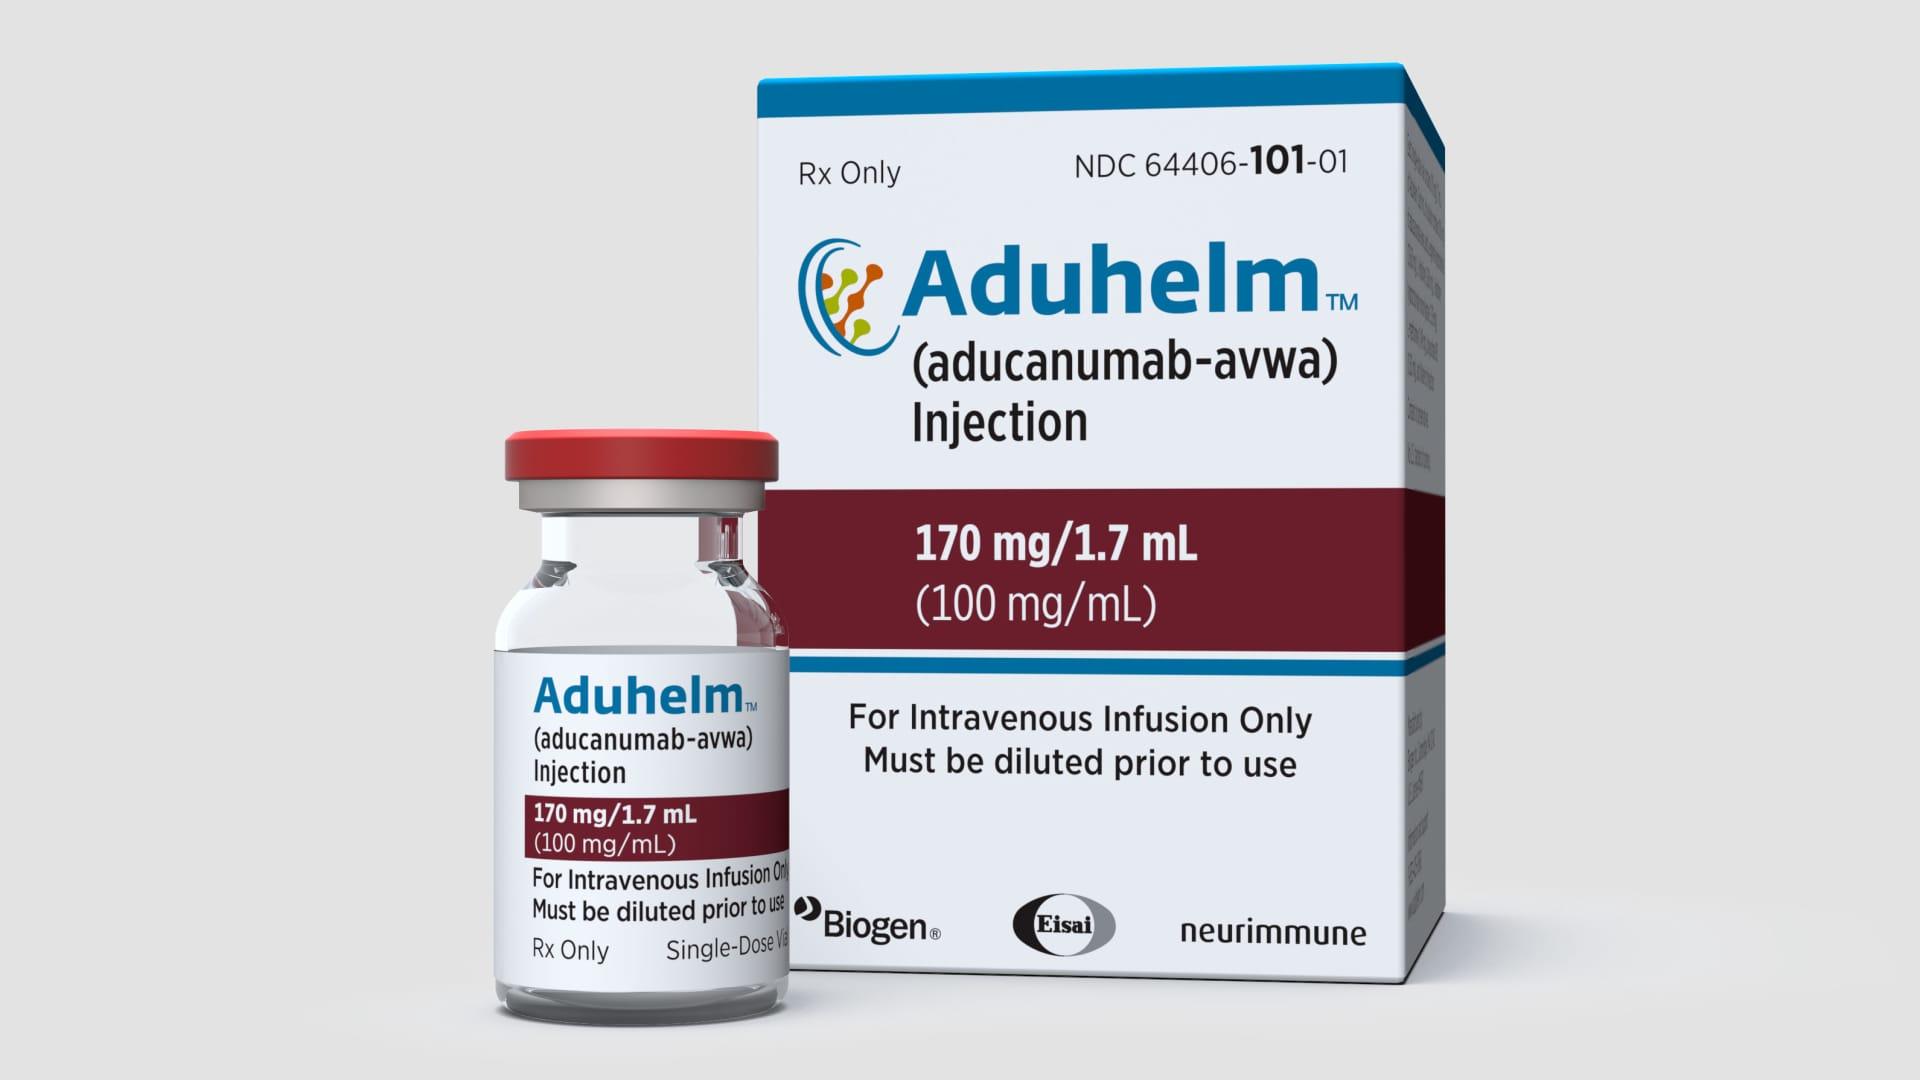 Aduhelm by Biogen